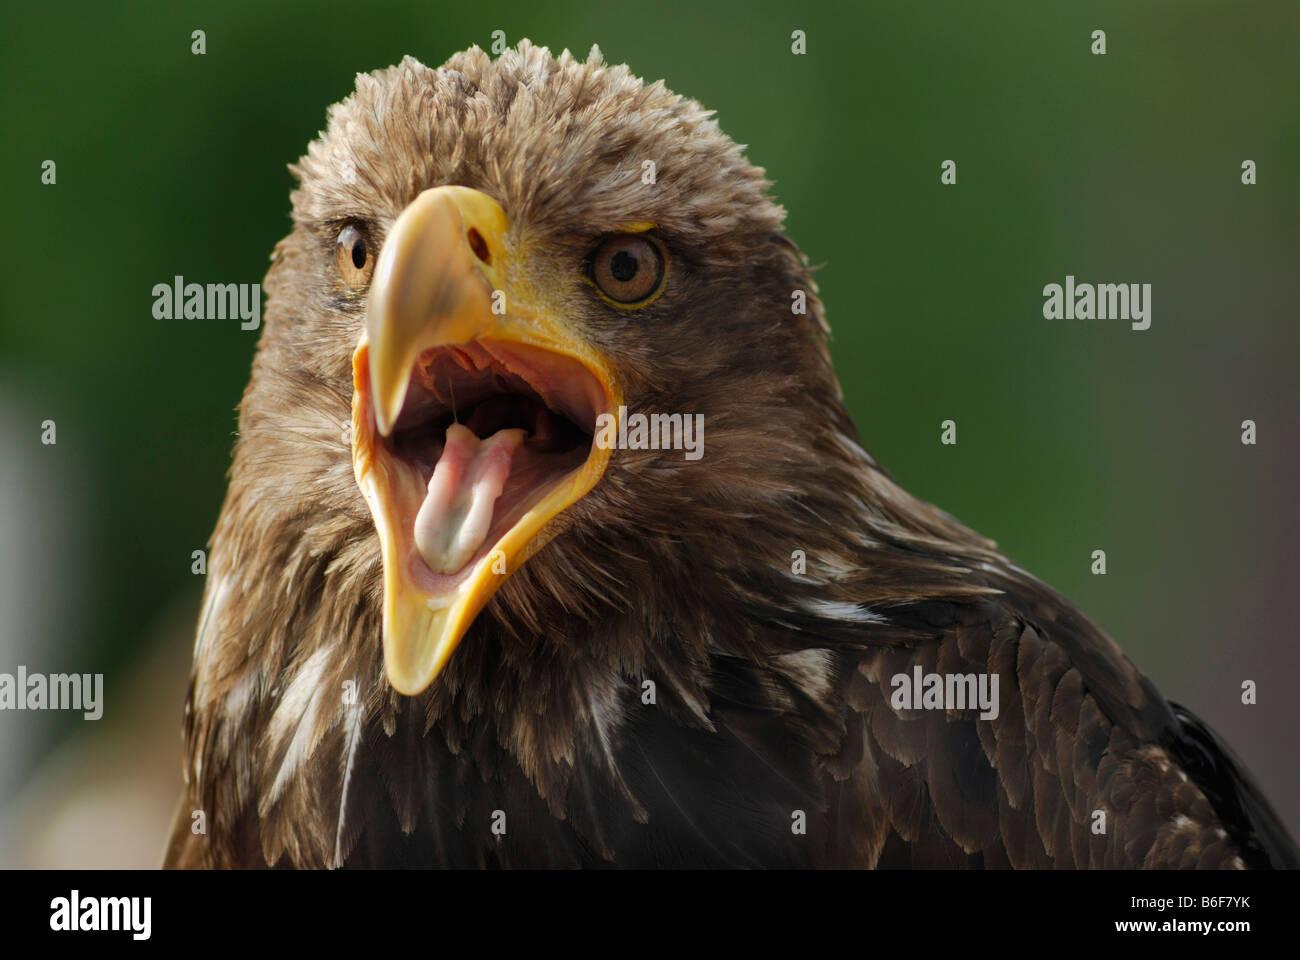 Adler (Aquila) mit offenen Schnabel, Porträt Stockbild